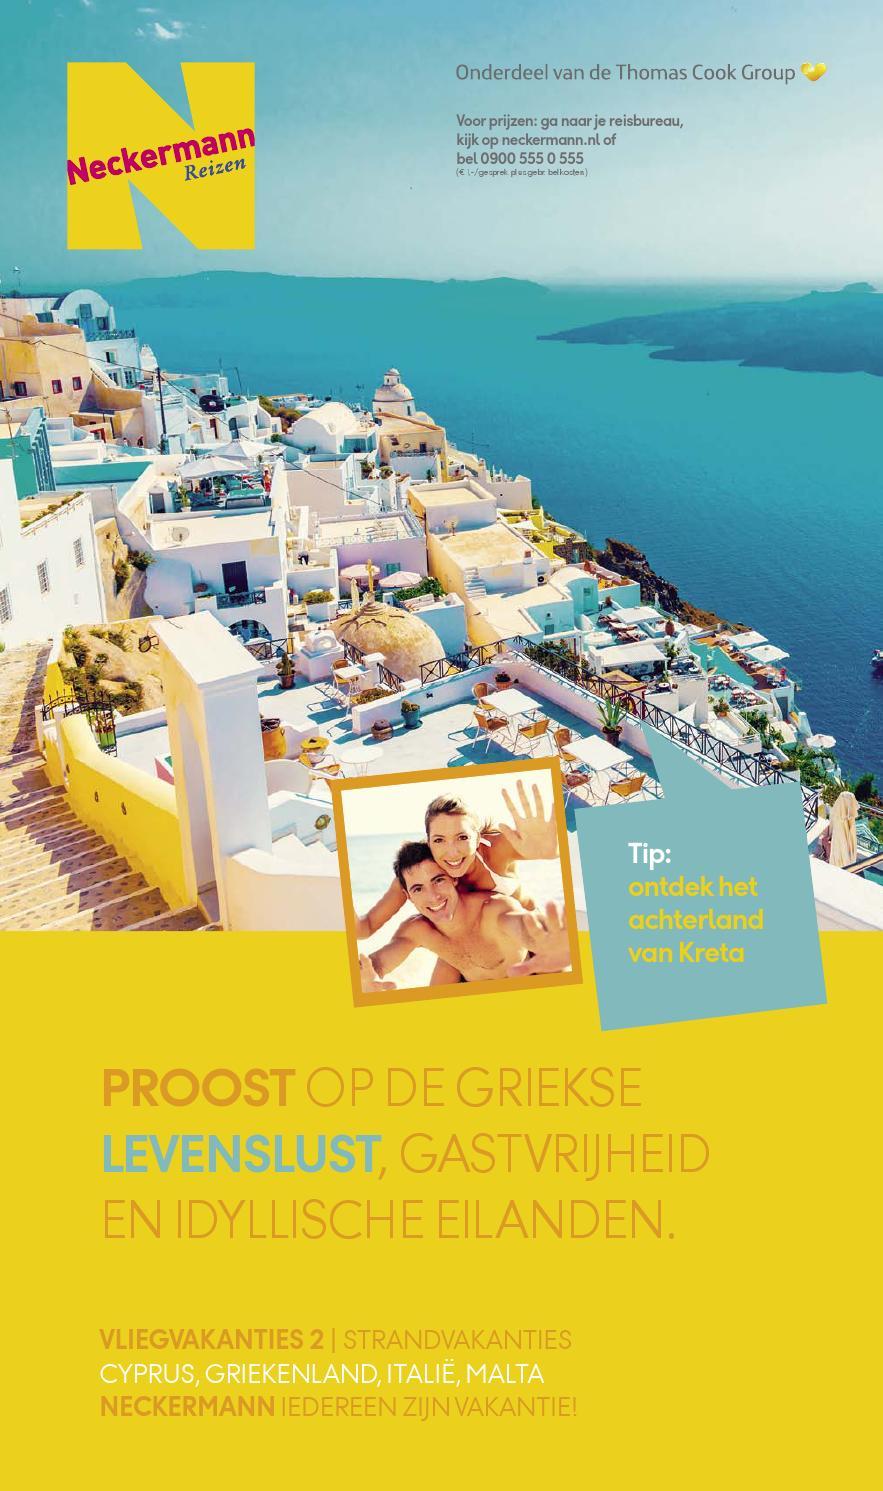 Babybed opmaken zomer - Neckermann Gids 2 Griekenland Itali Malta Zomer 2015 By Joeri Van Peel Issuu